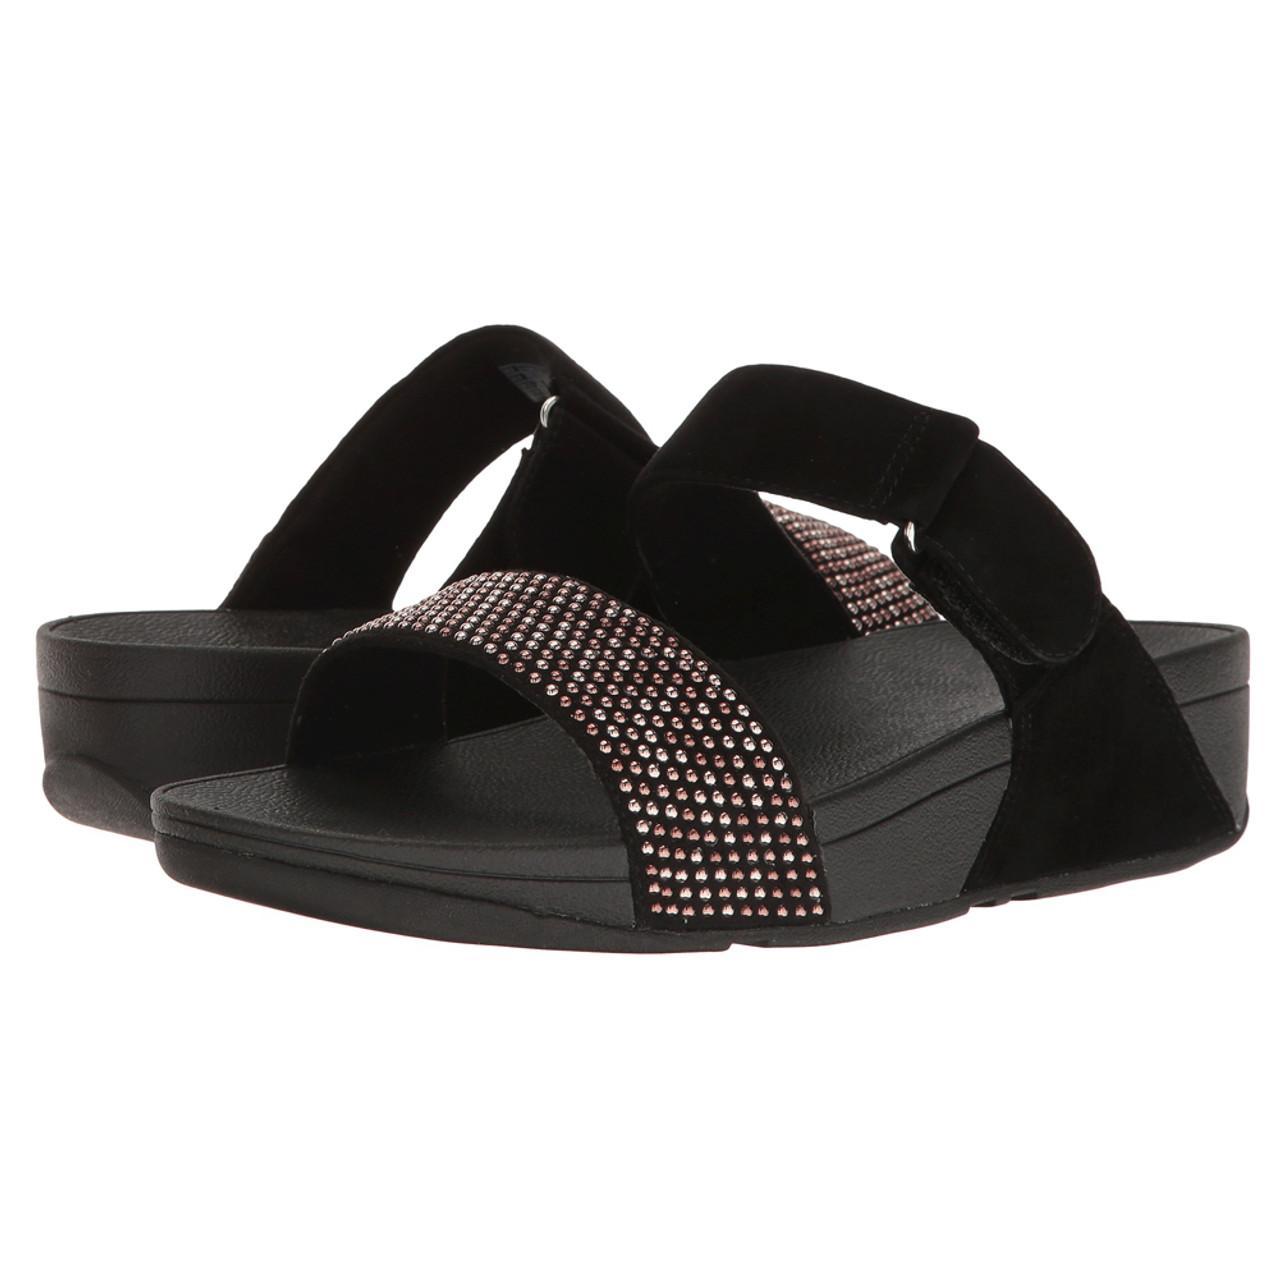 69d4fc59e0d Fitflop Women s Lulu Popstud Slide Black - Shop now   Shoolu.com